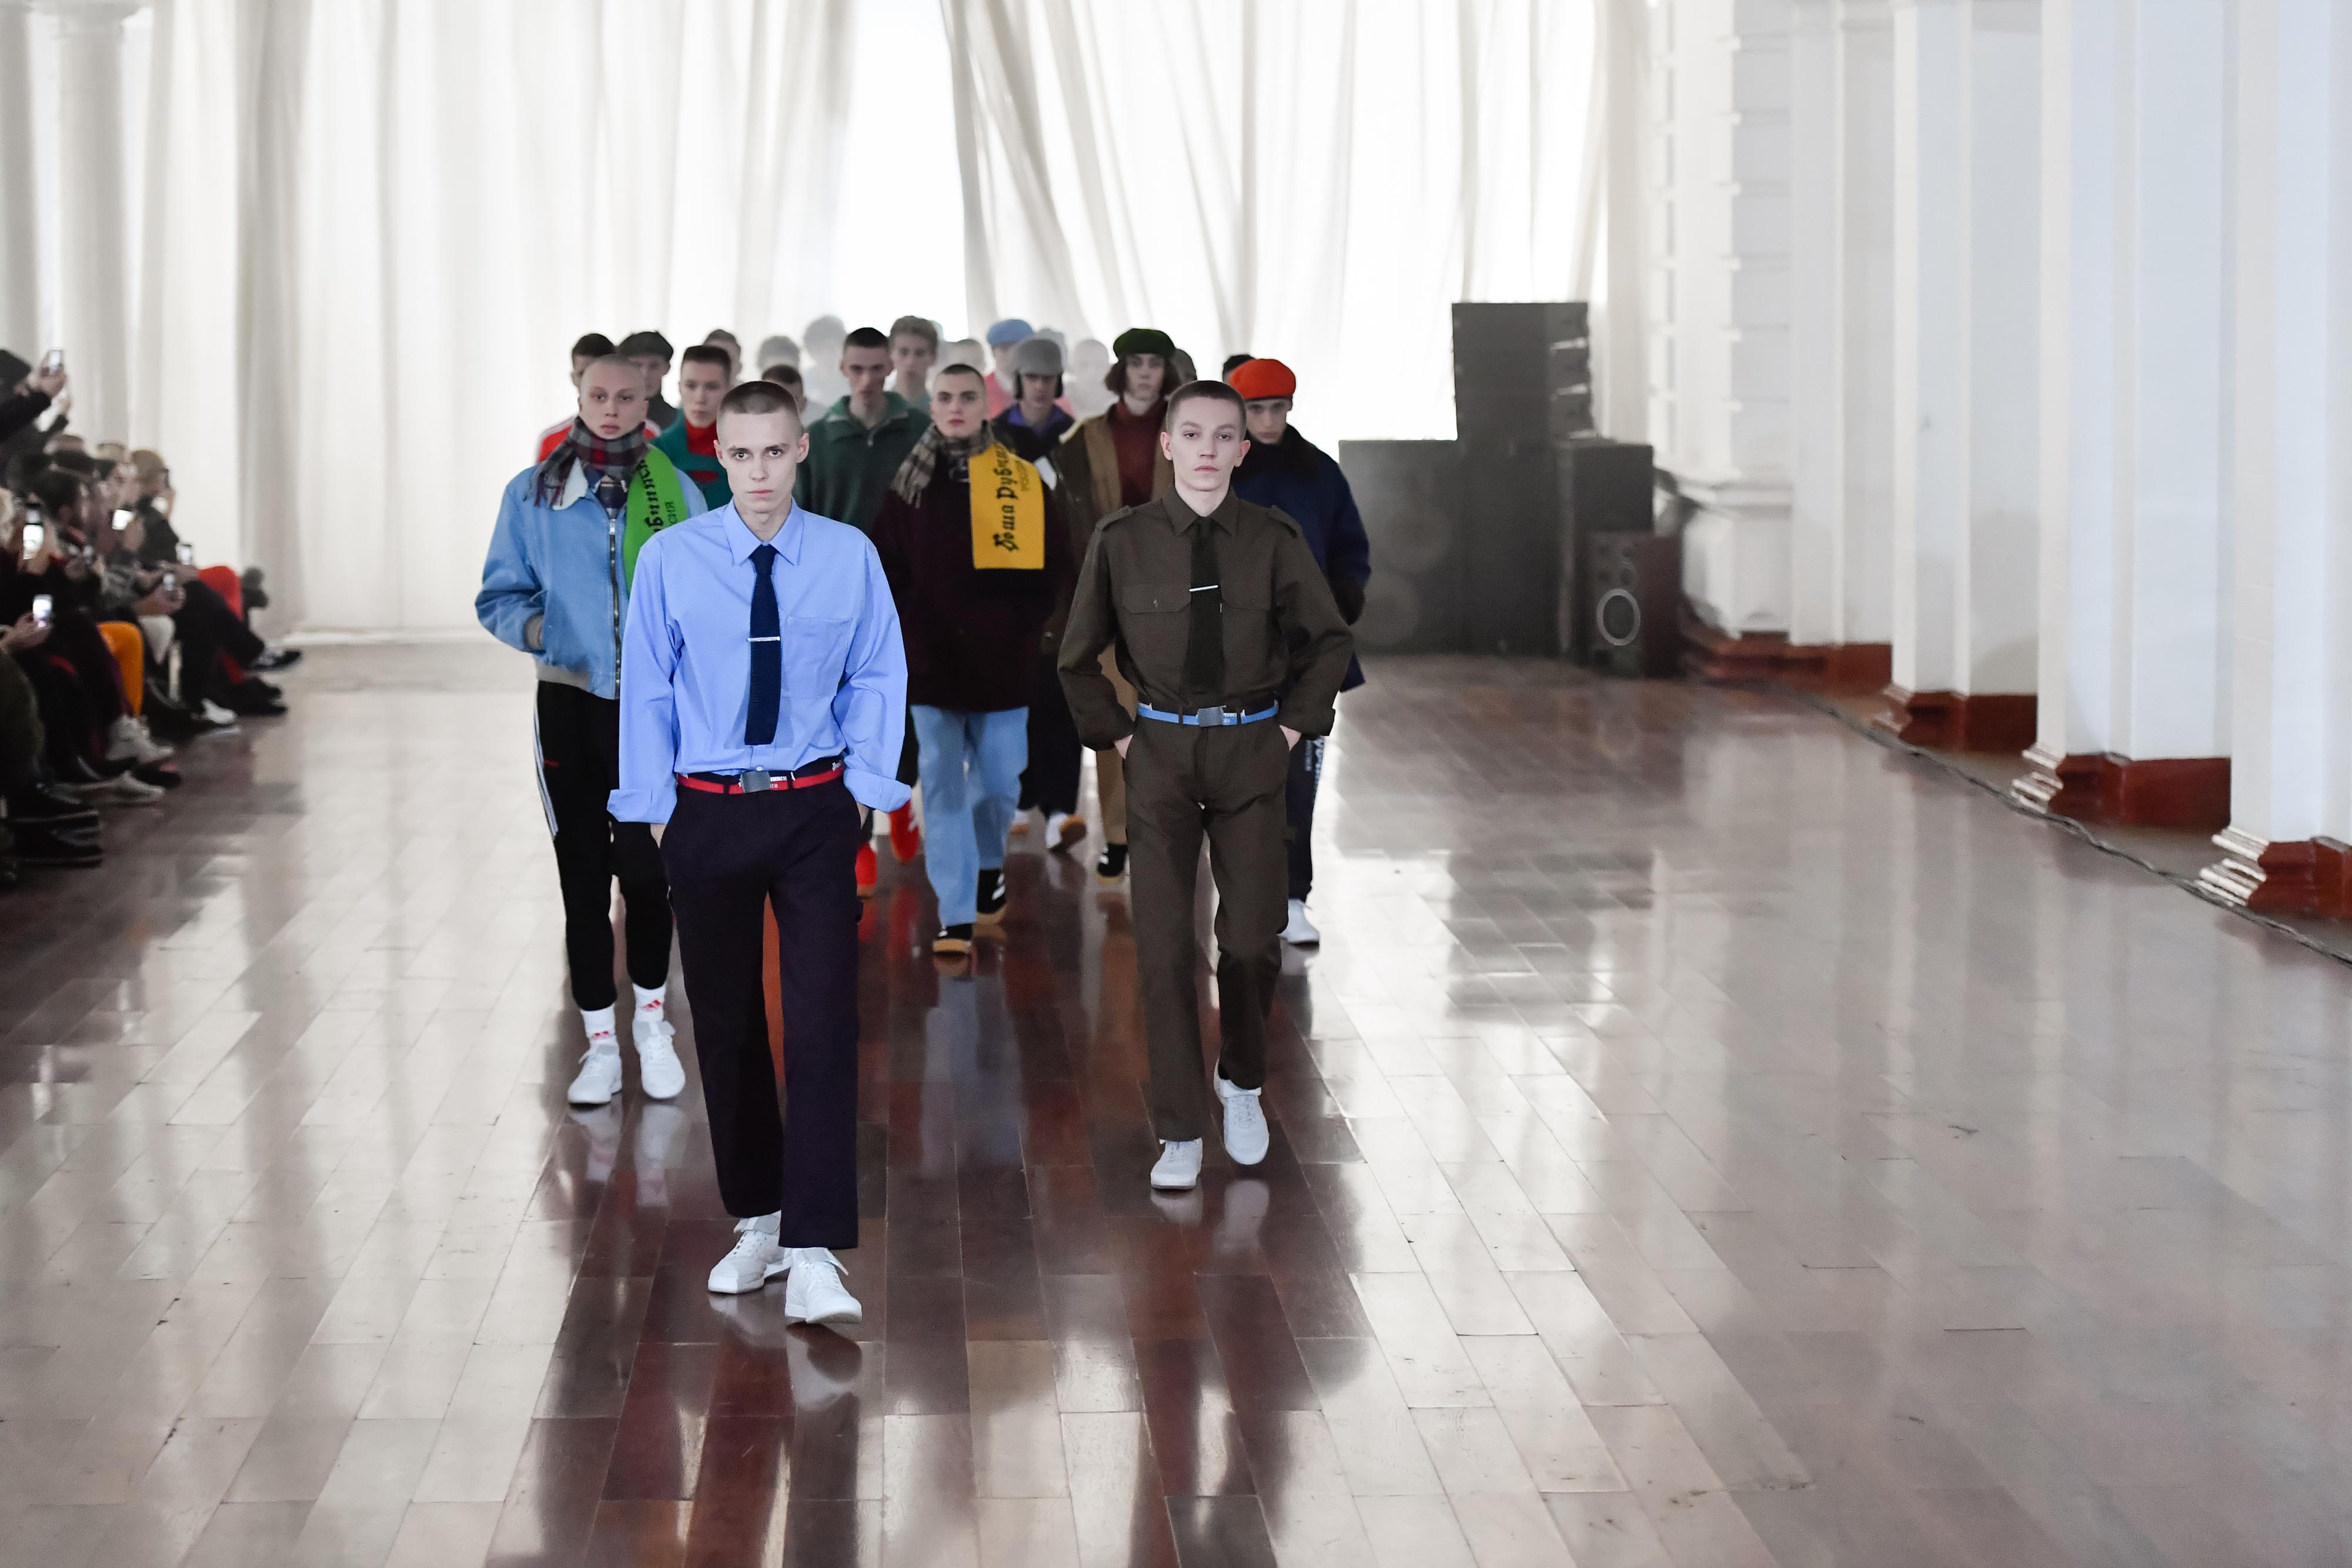 GOSHA RUBCHINSKIY FALL WINTER 2017/18 COLLECTION RUSSIA